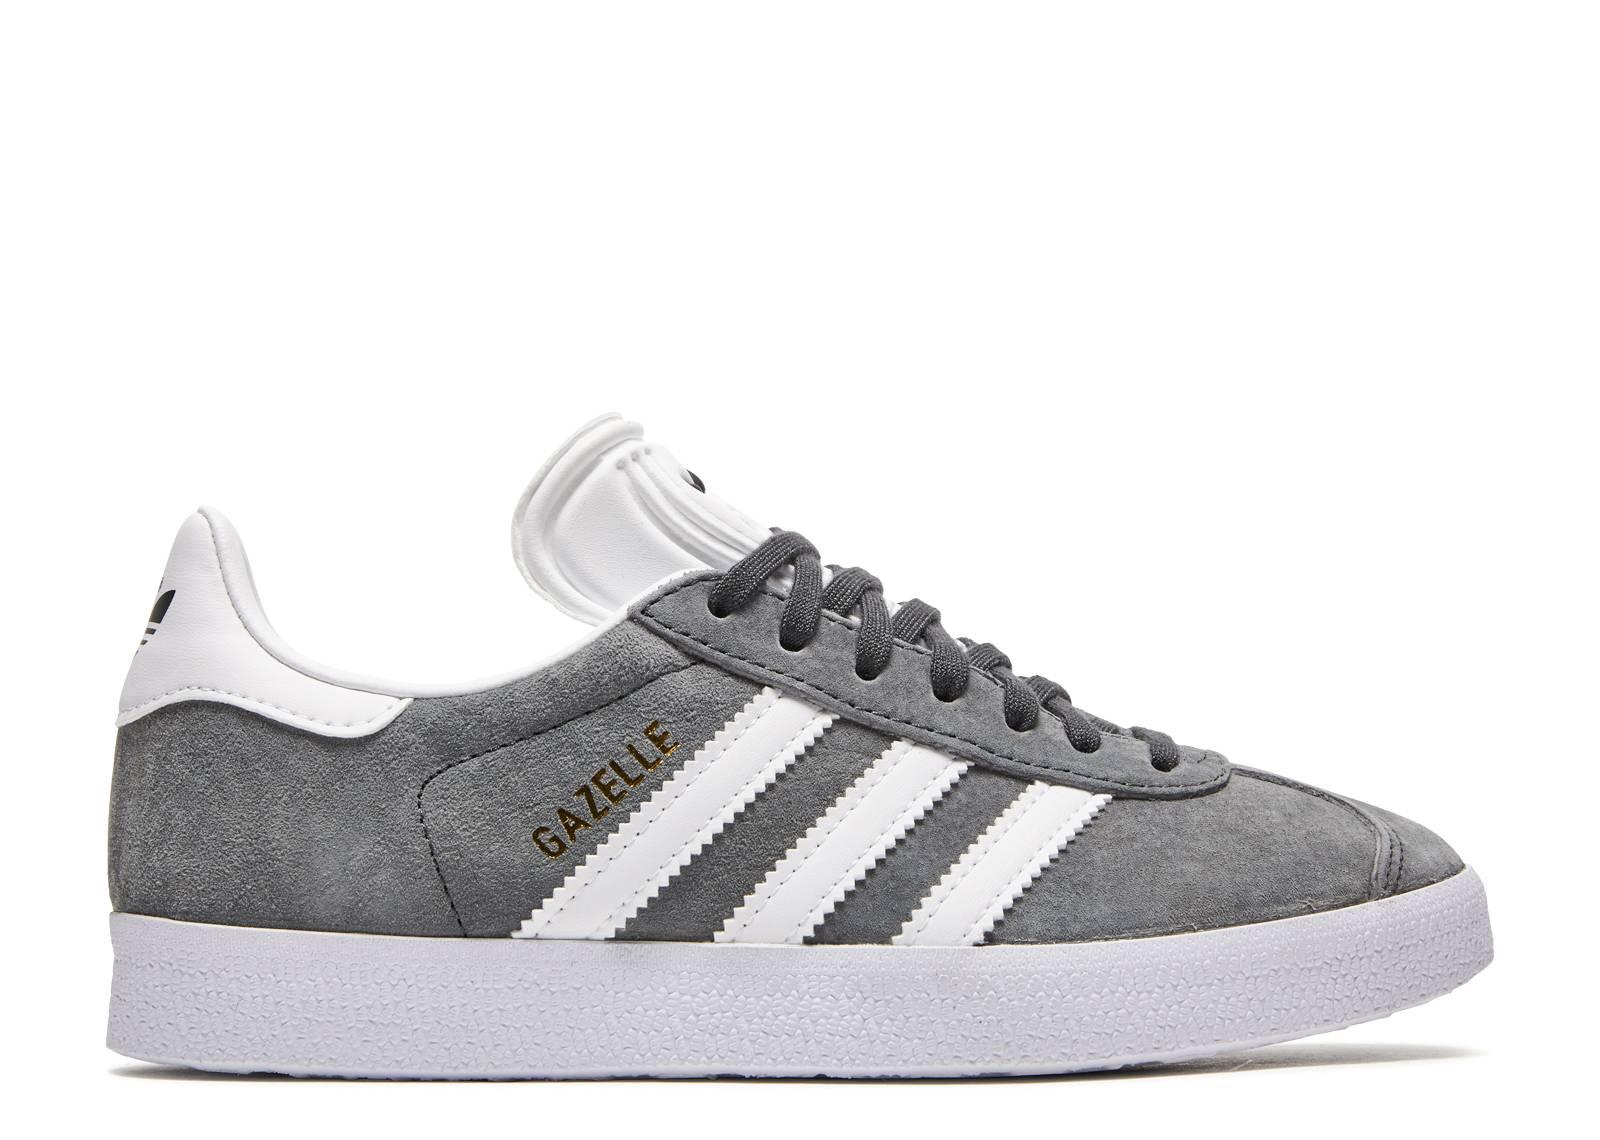 Adidas |Adidas gazelle dgsogrwhitegoldmt Adidas BB5480